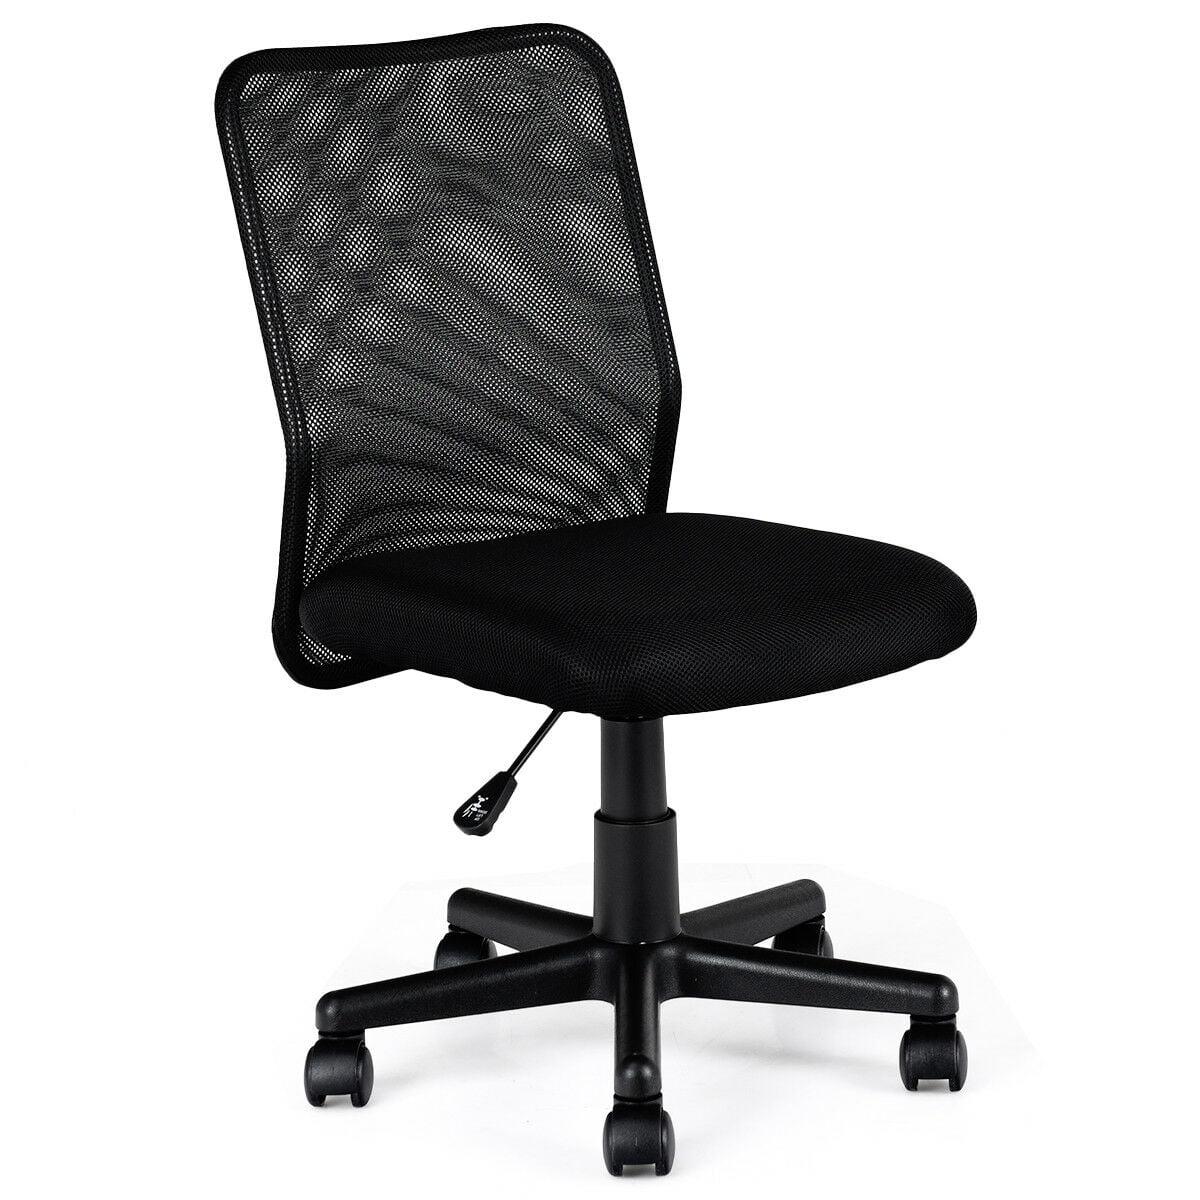 Costway Mid-back Adjustable Ergonomic Mesh Swivel Computer Office Desk Task Chair